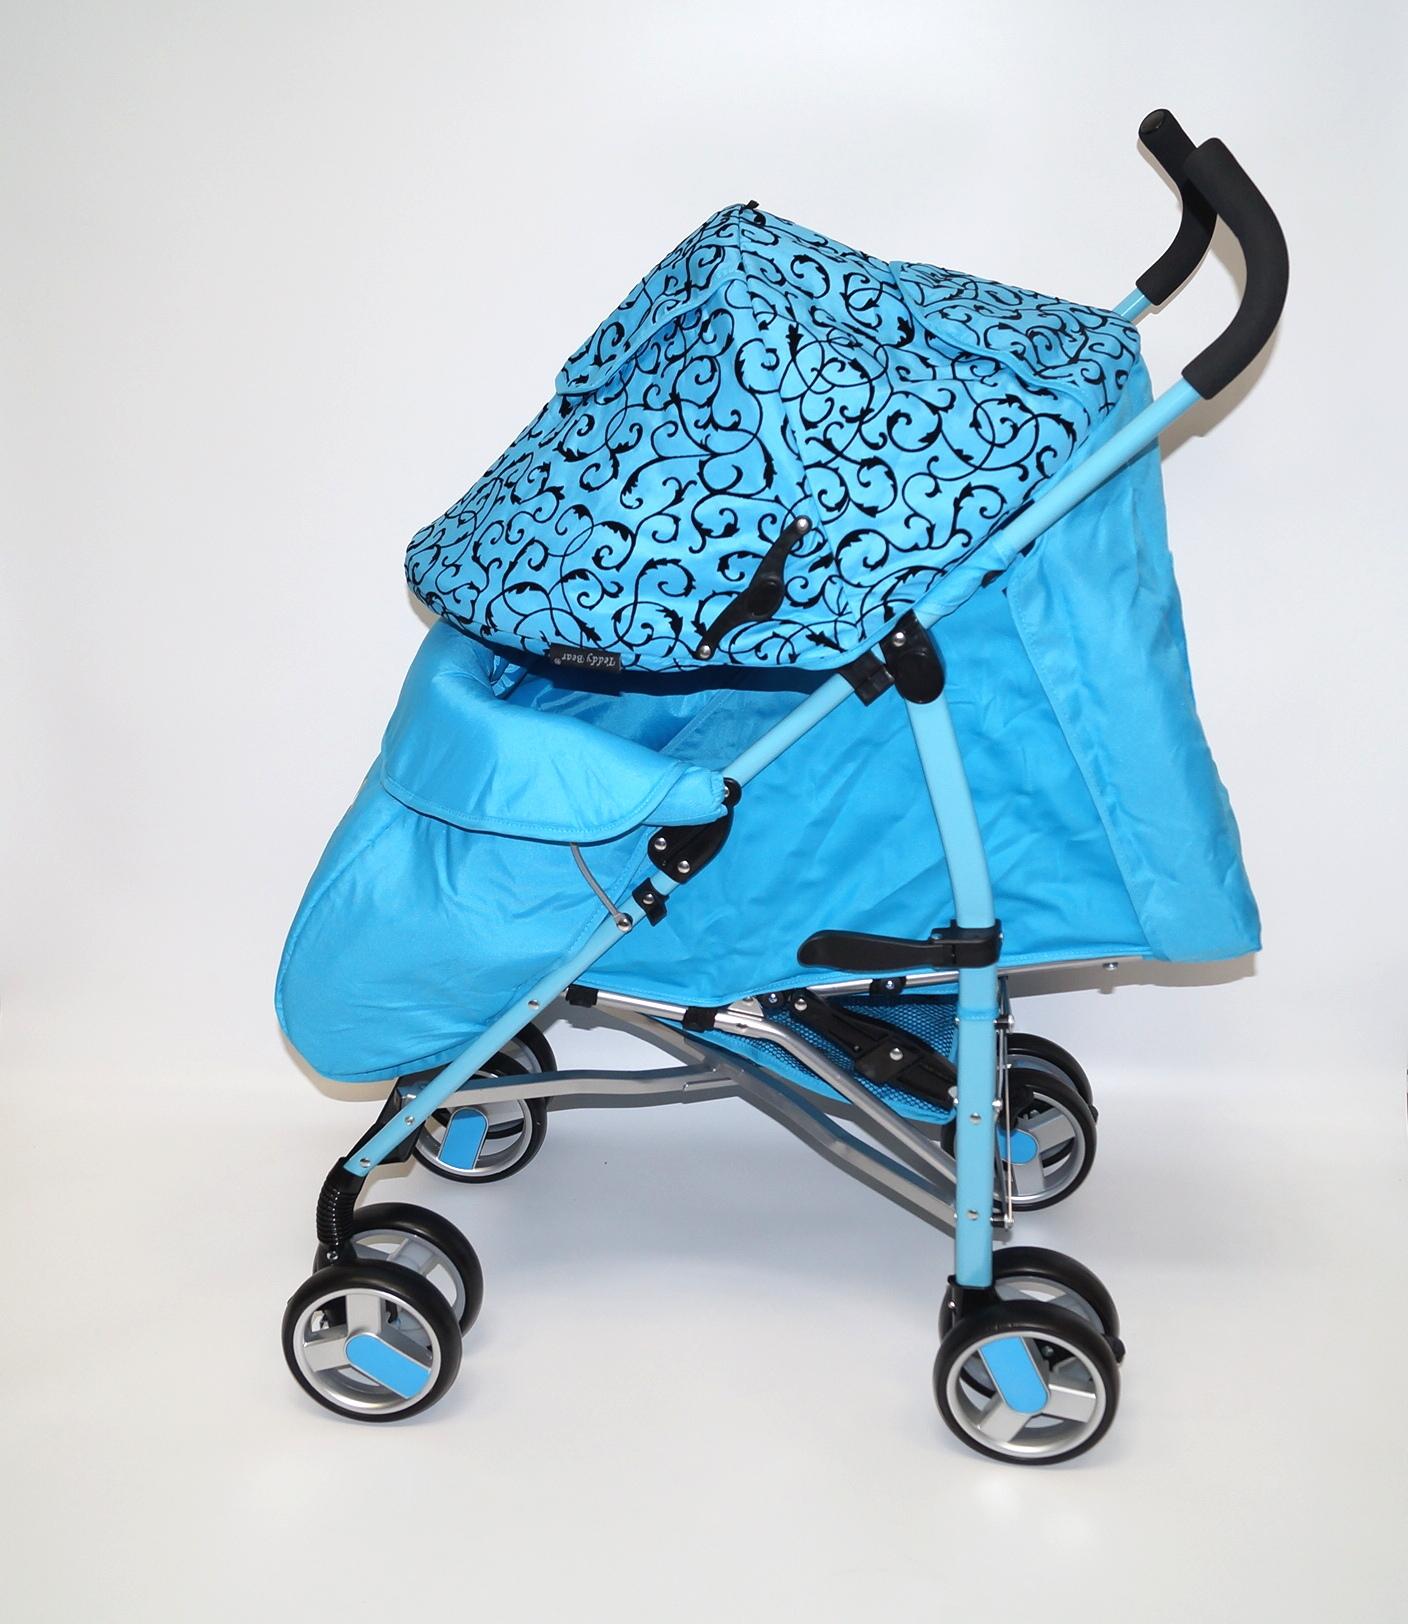 Прогулочная коляска Teddy Bear SL - 109 Graffiti grey